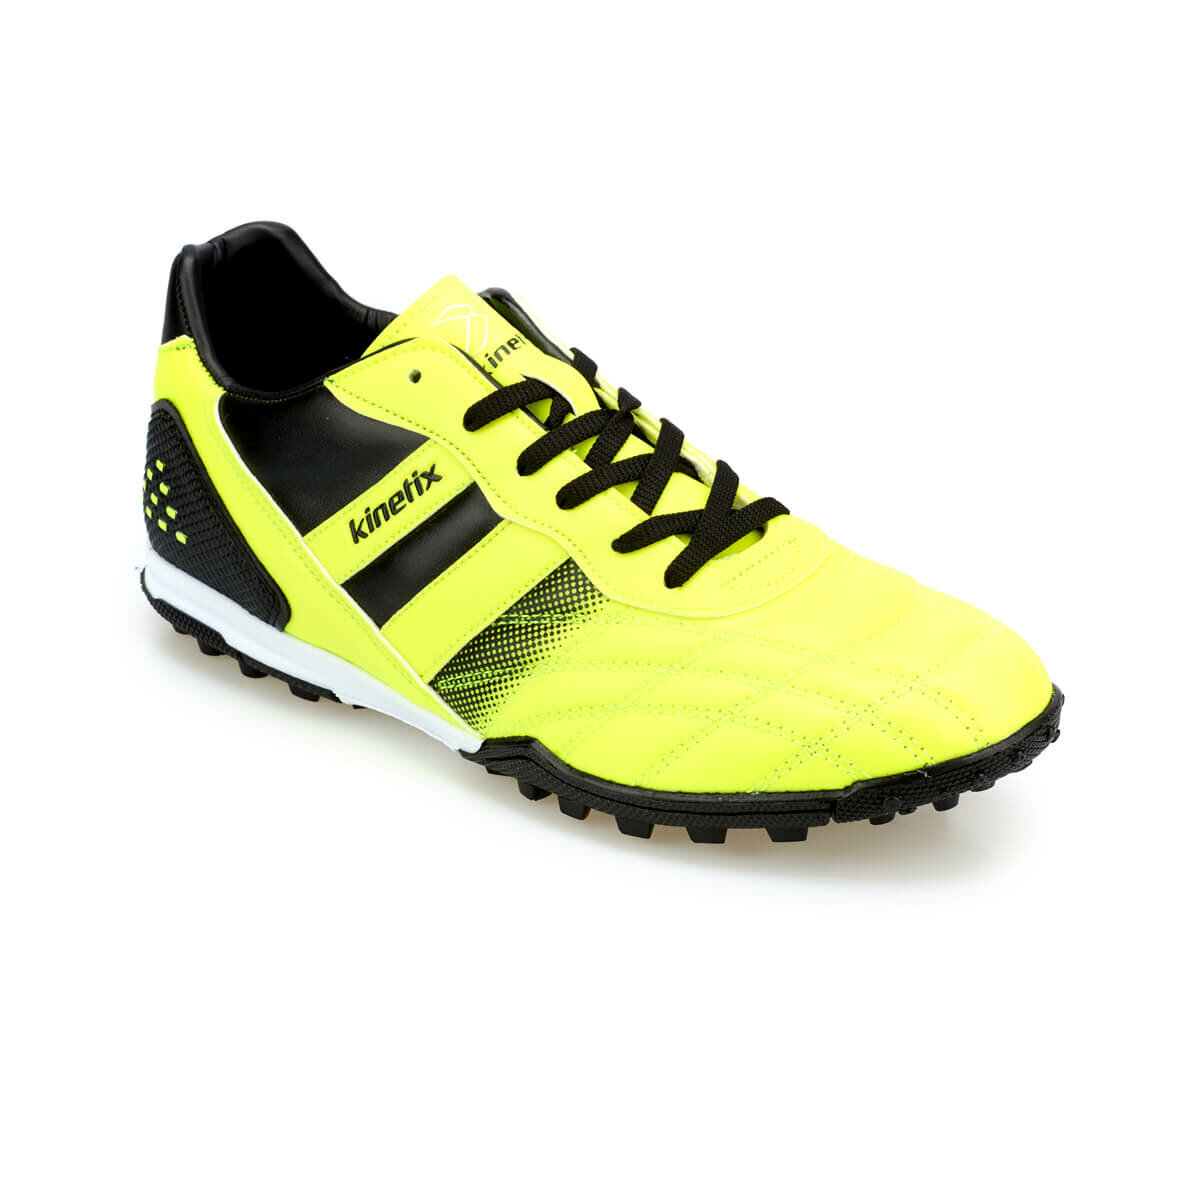 FLO VOLKY TURF Neon Green Male Astroturf Shoes KINETIX